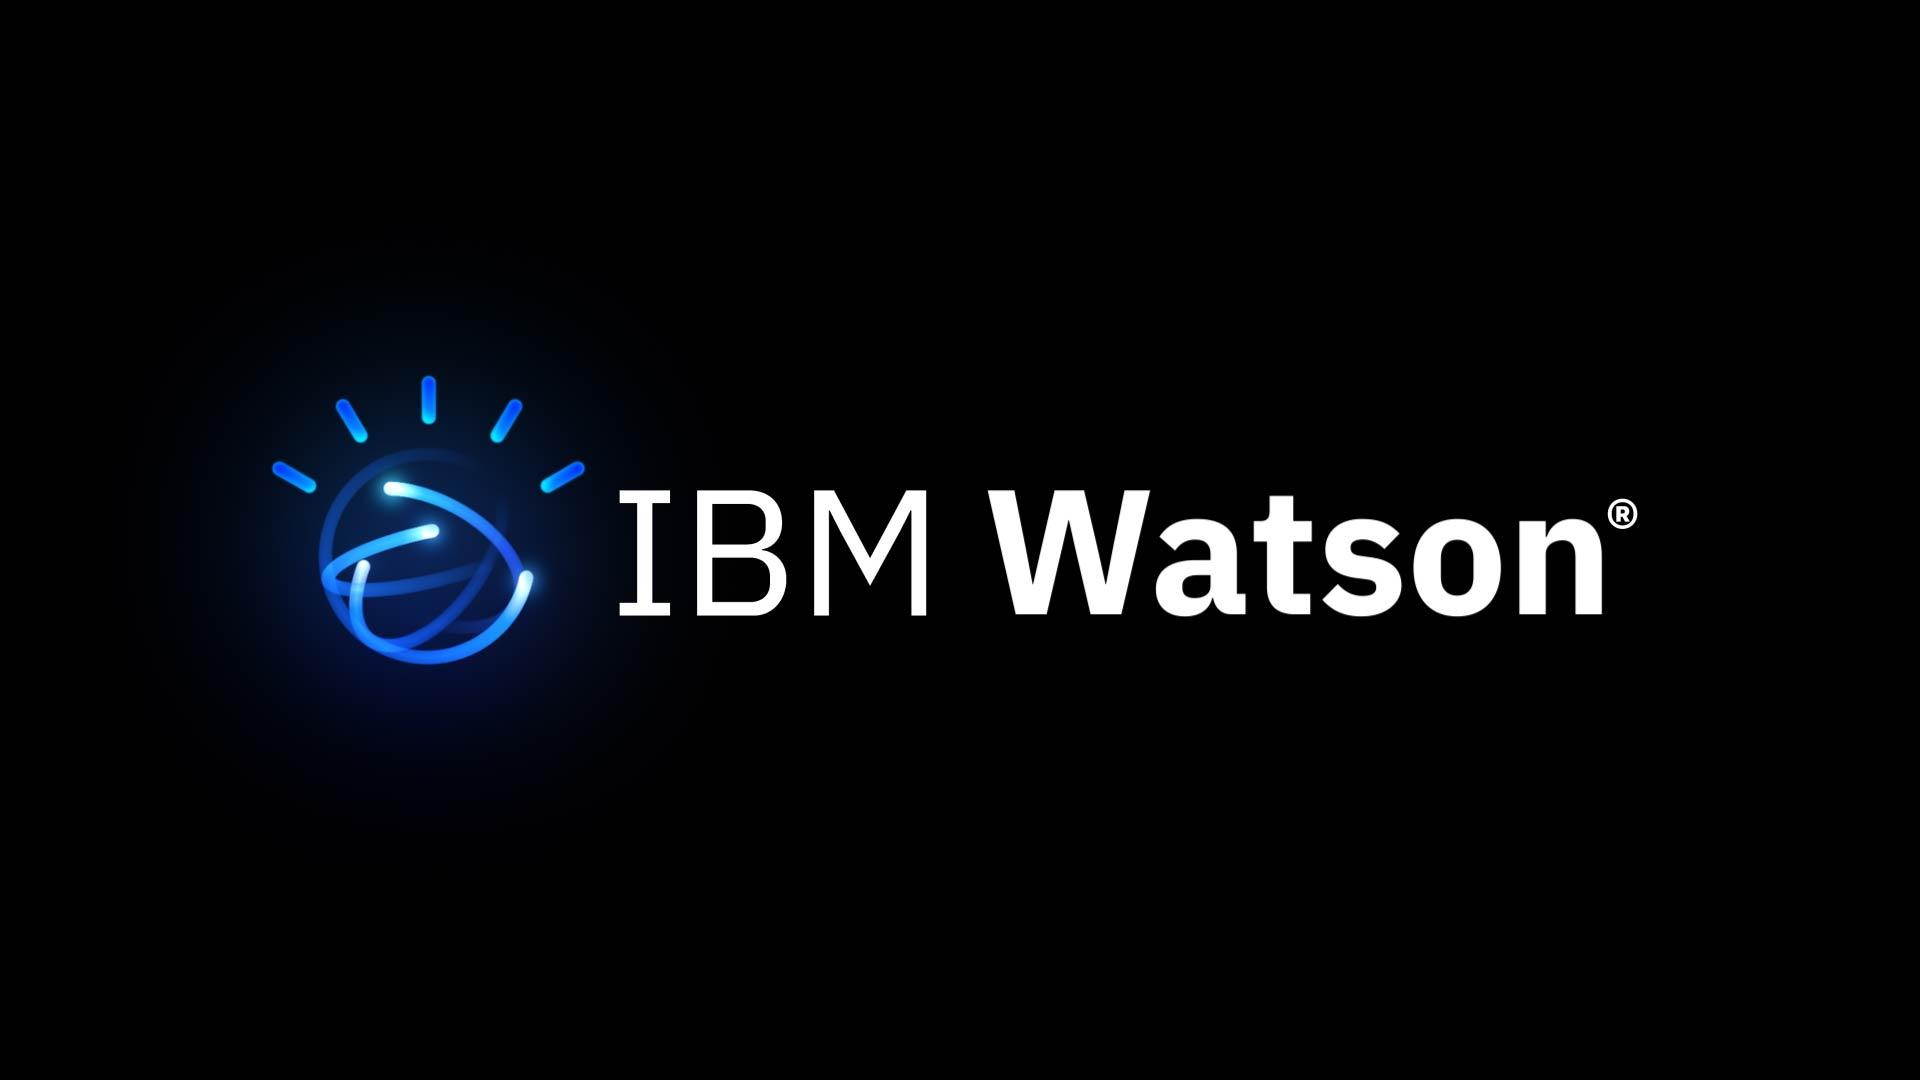 Watson_master_stems_20180315 (1-01-19-10).jpg